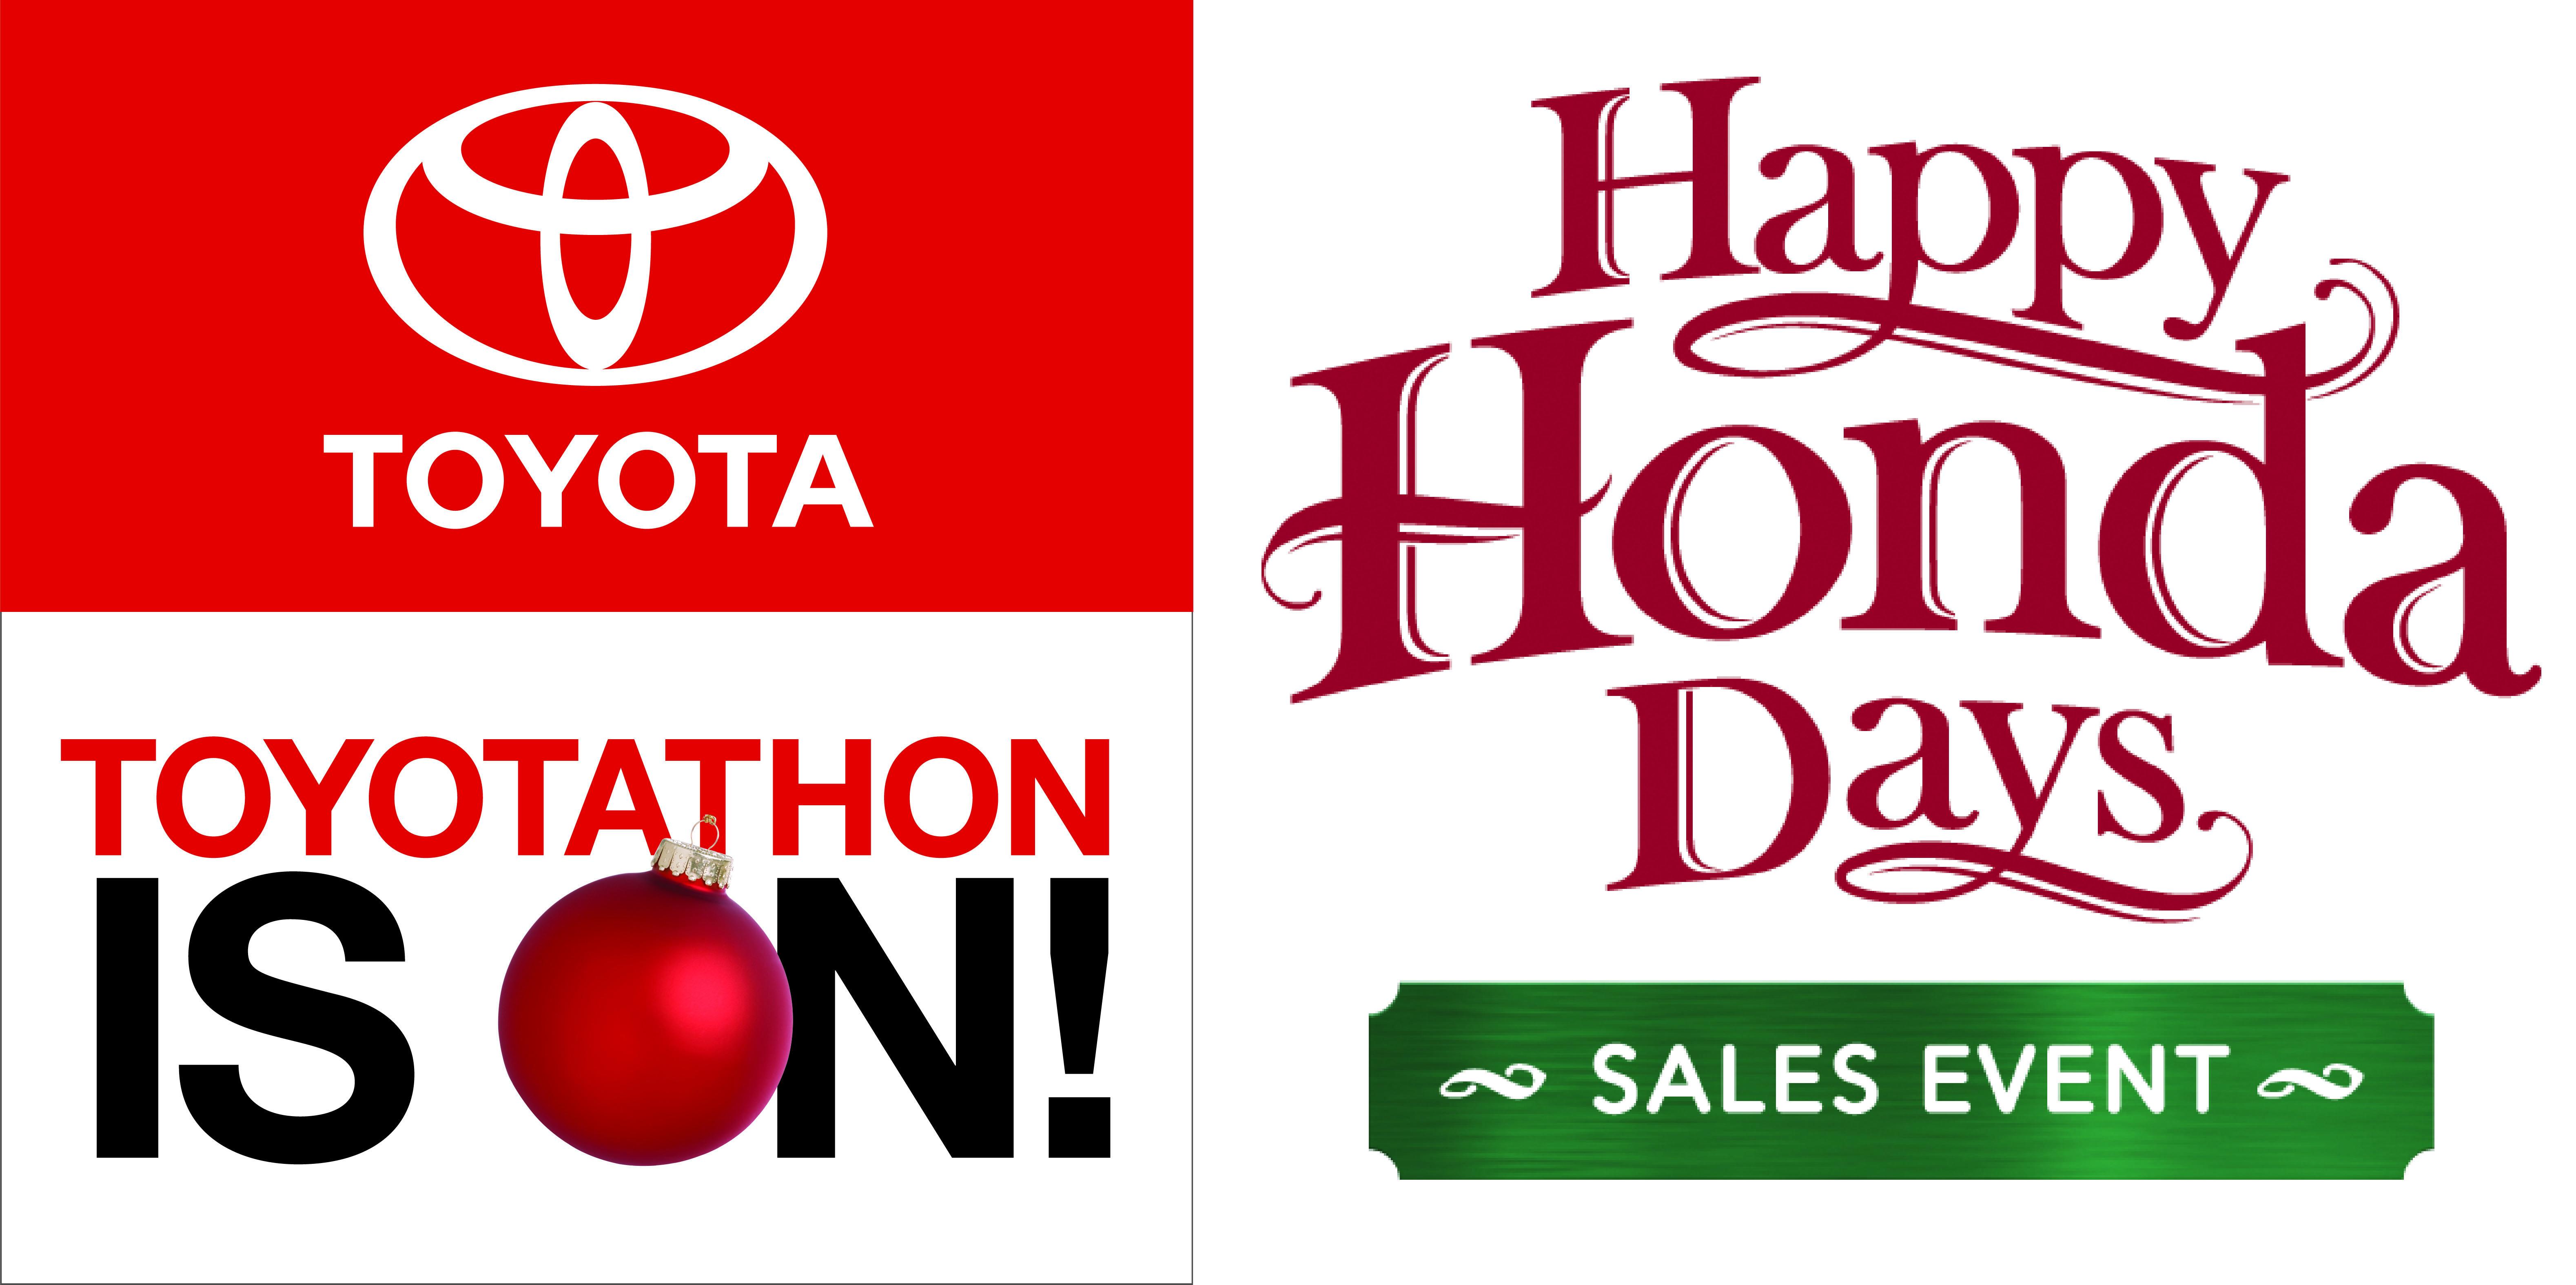 Happy Honda Days And Toyotathon